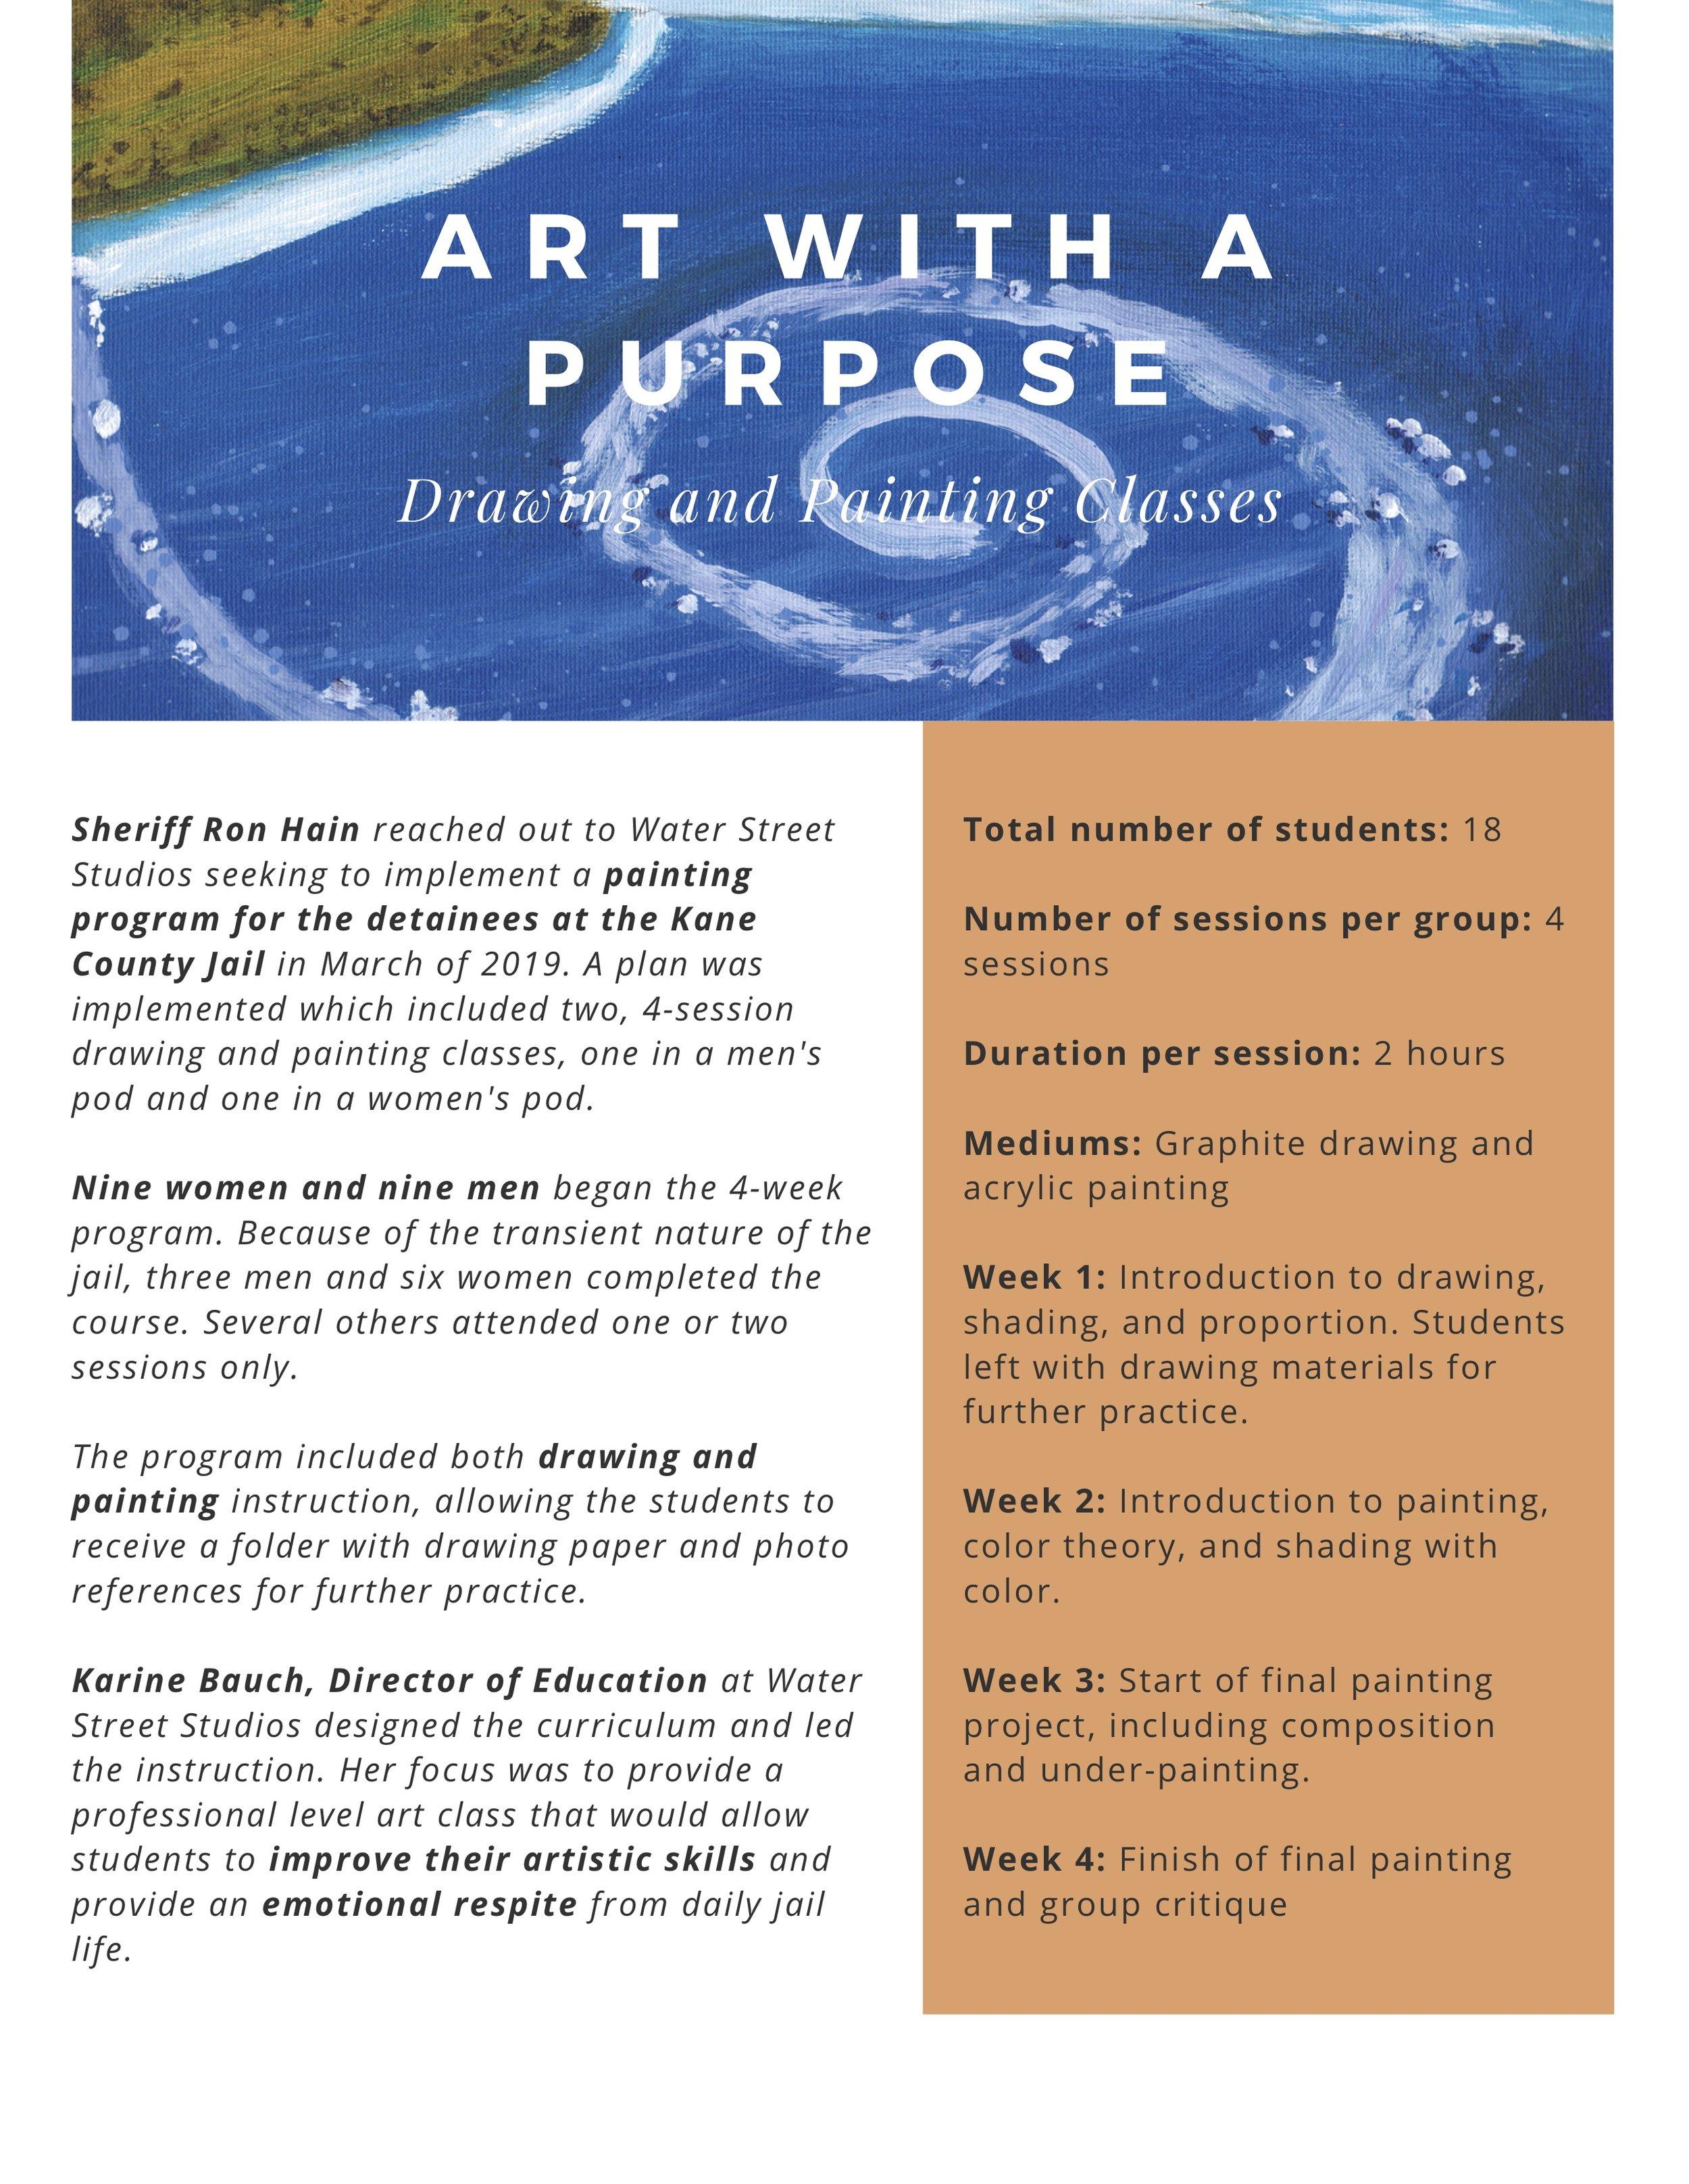 KCJ Pilot Arts Program Report2.jpg